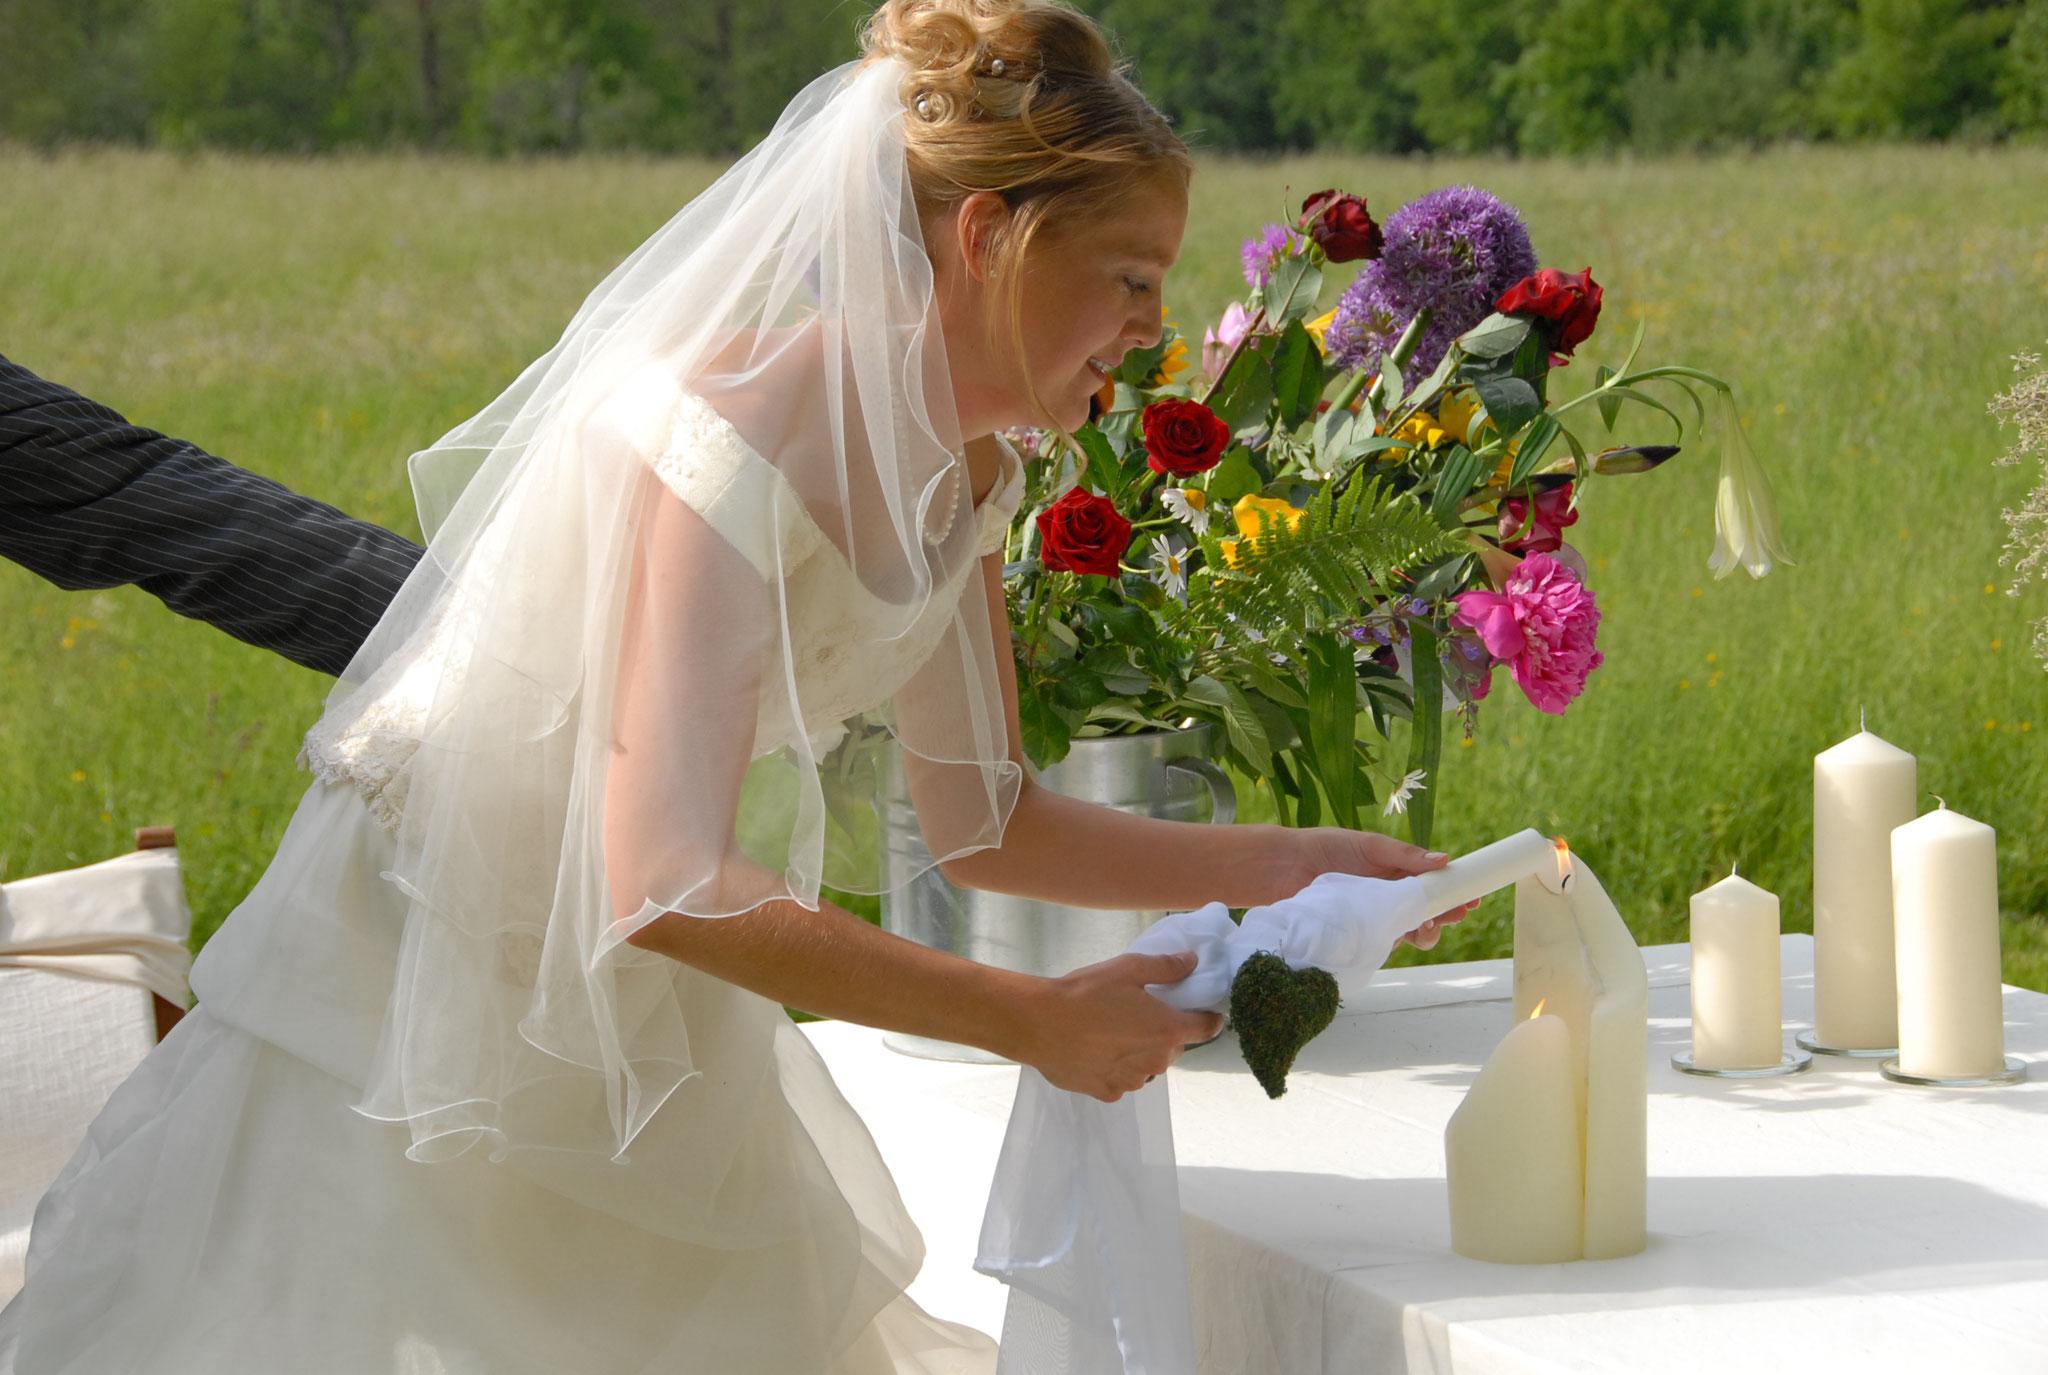 Freie Trauung | Hochzeitsrituale | Traurituale | Traukerze | Freie Traurednerin | Melanie-Christine Kuhles | Trau dich mit Emma